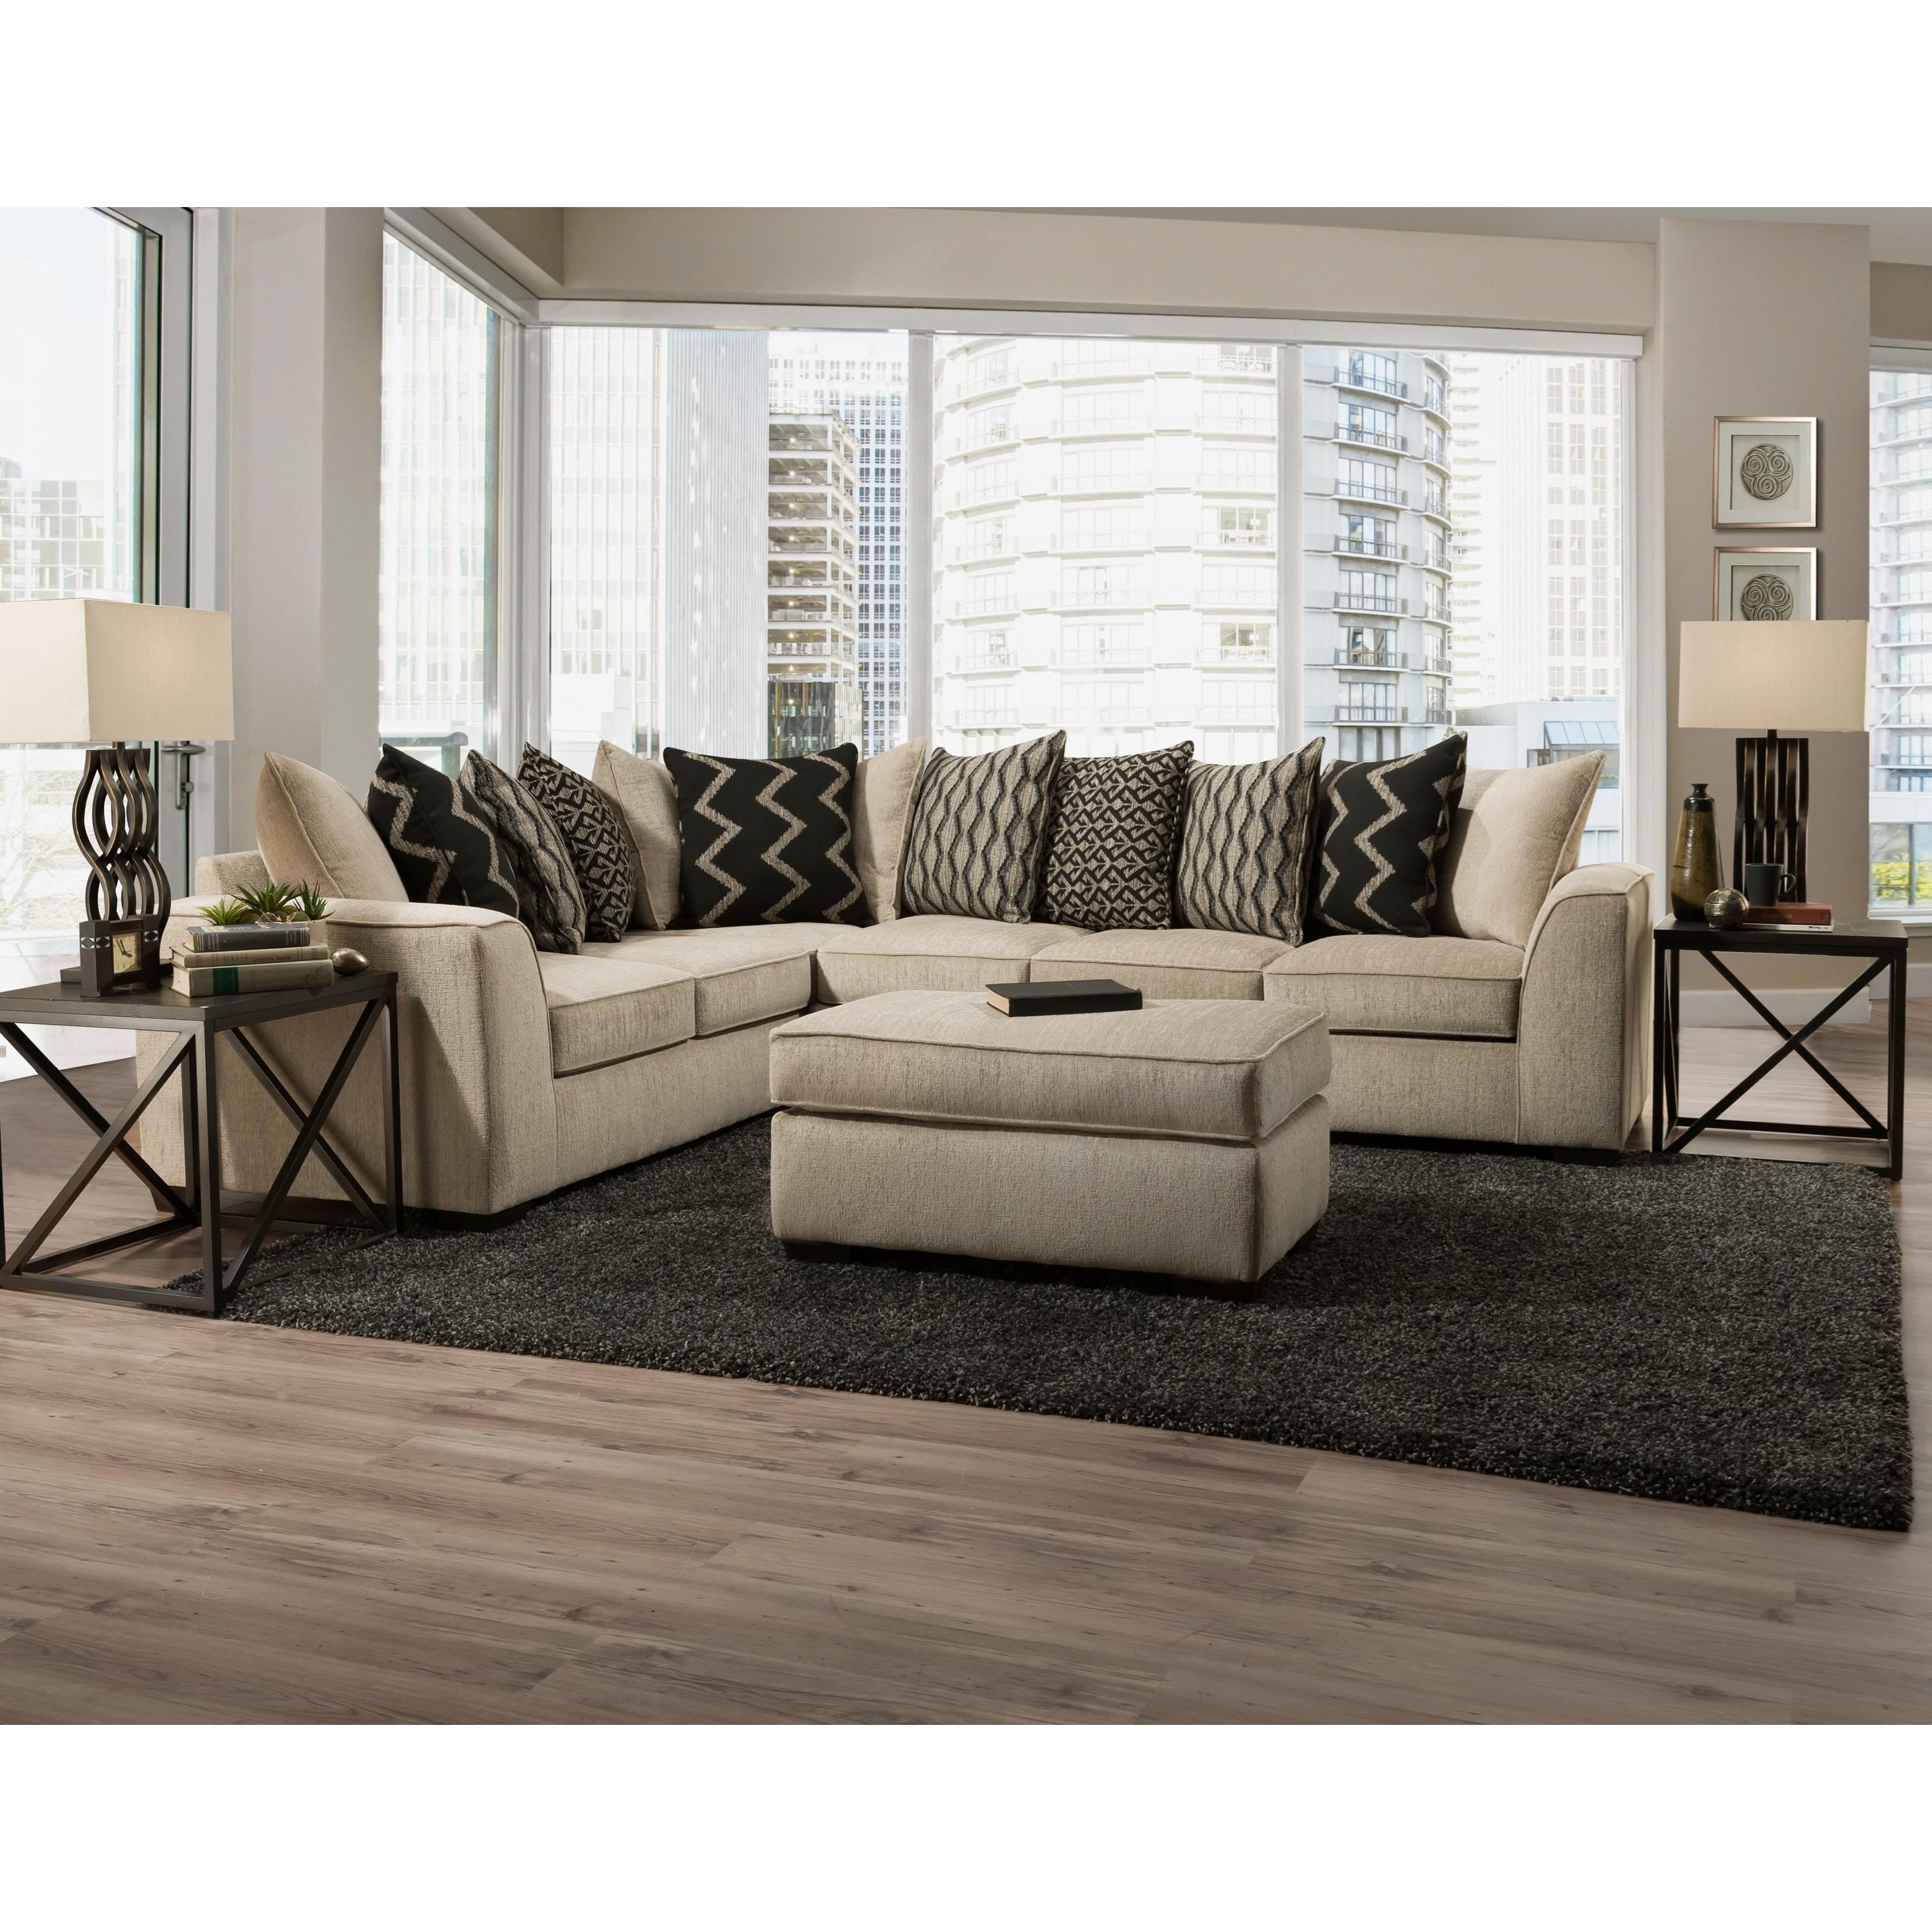 2600 Living Room Group by Vendor 610 at Becker Furniture